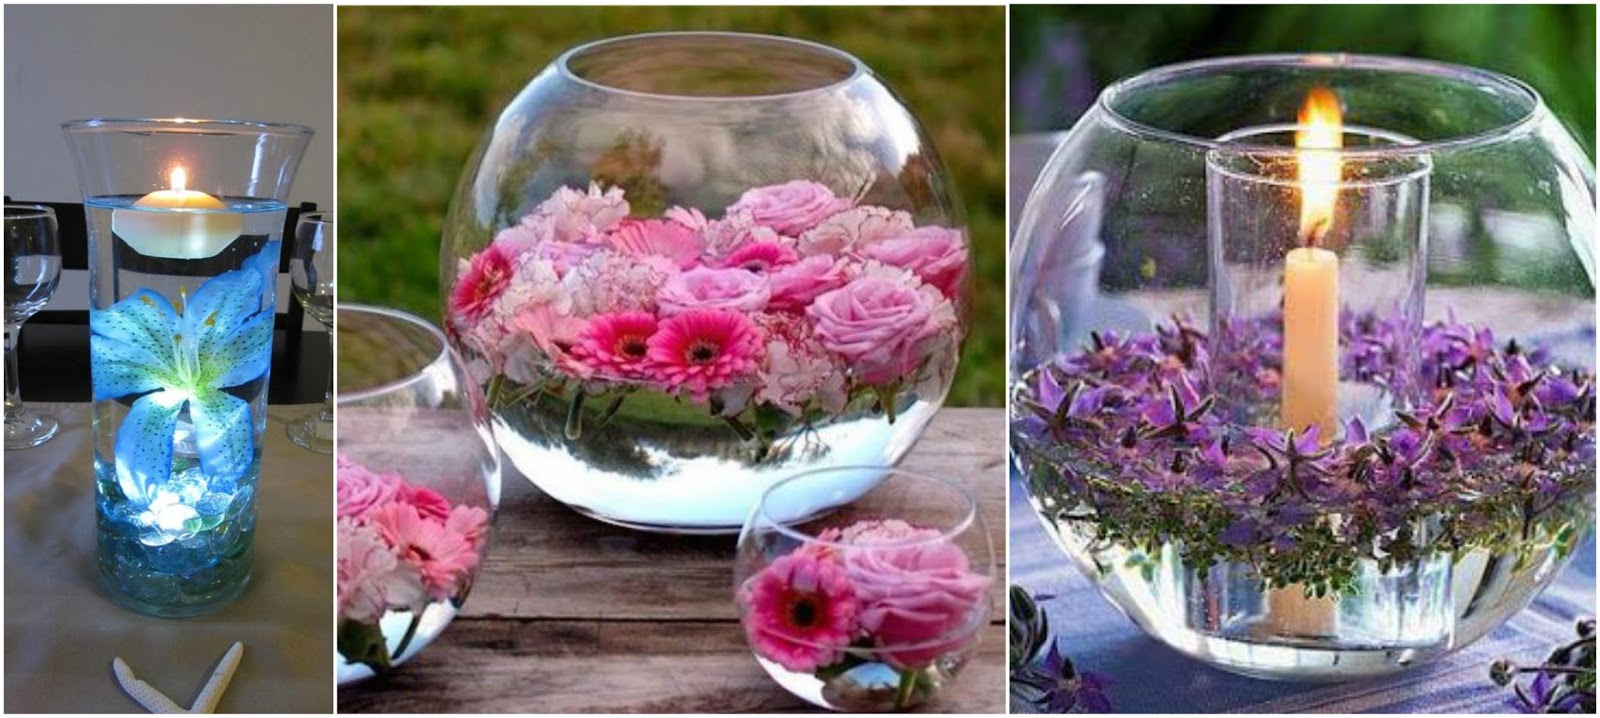 Peceras para tu mesa con flores flotantes truco casero - Decoracion de peceras ...